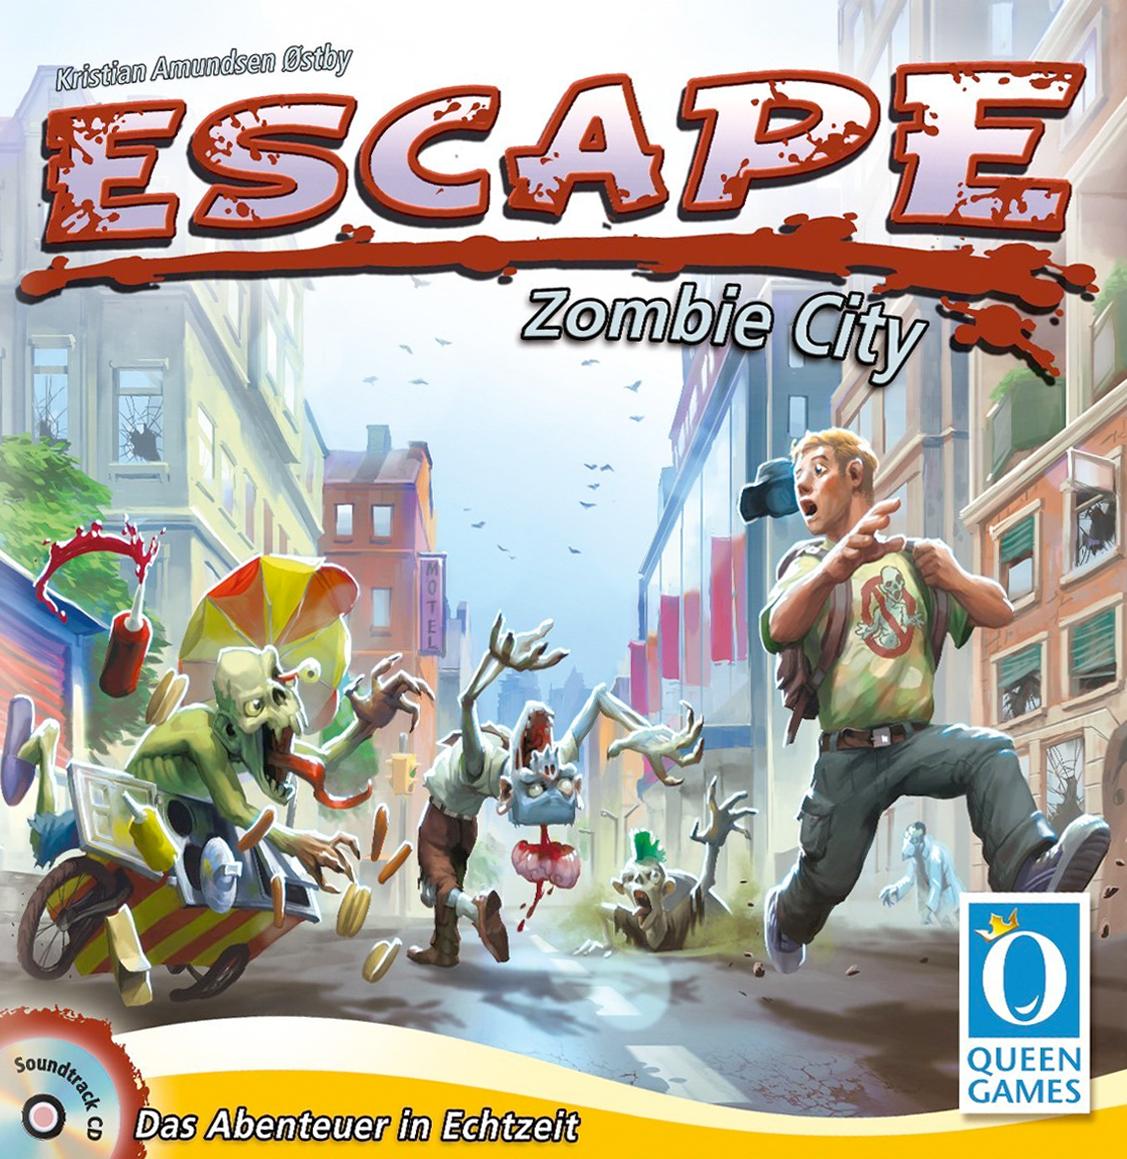 Queen Games 10030 Zombie City Escape